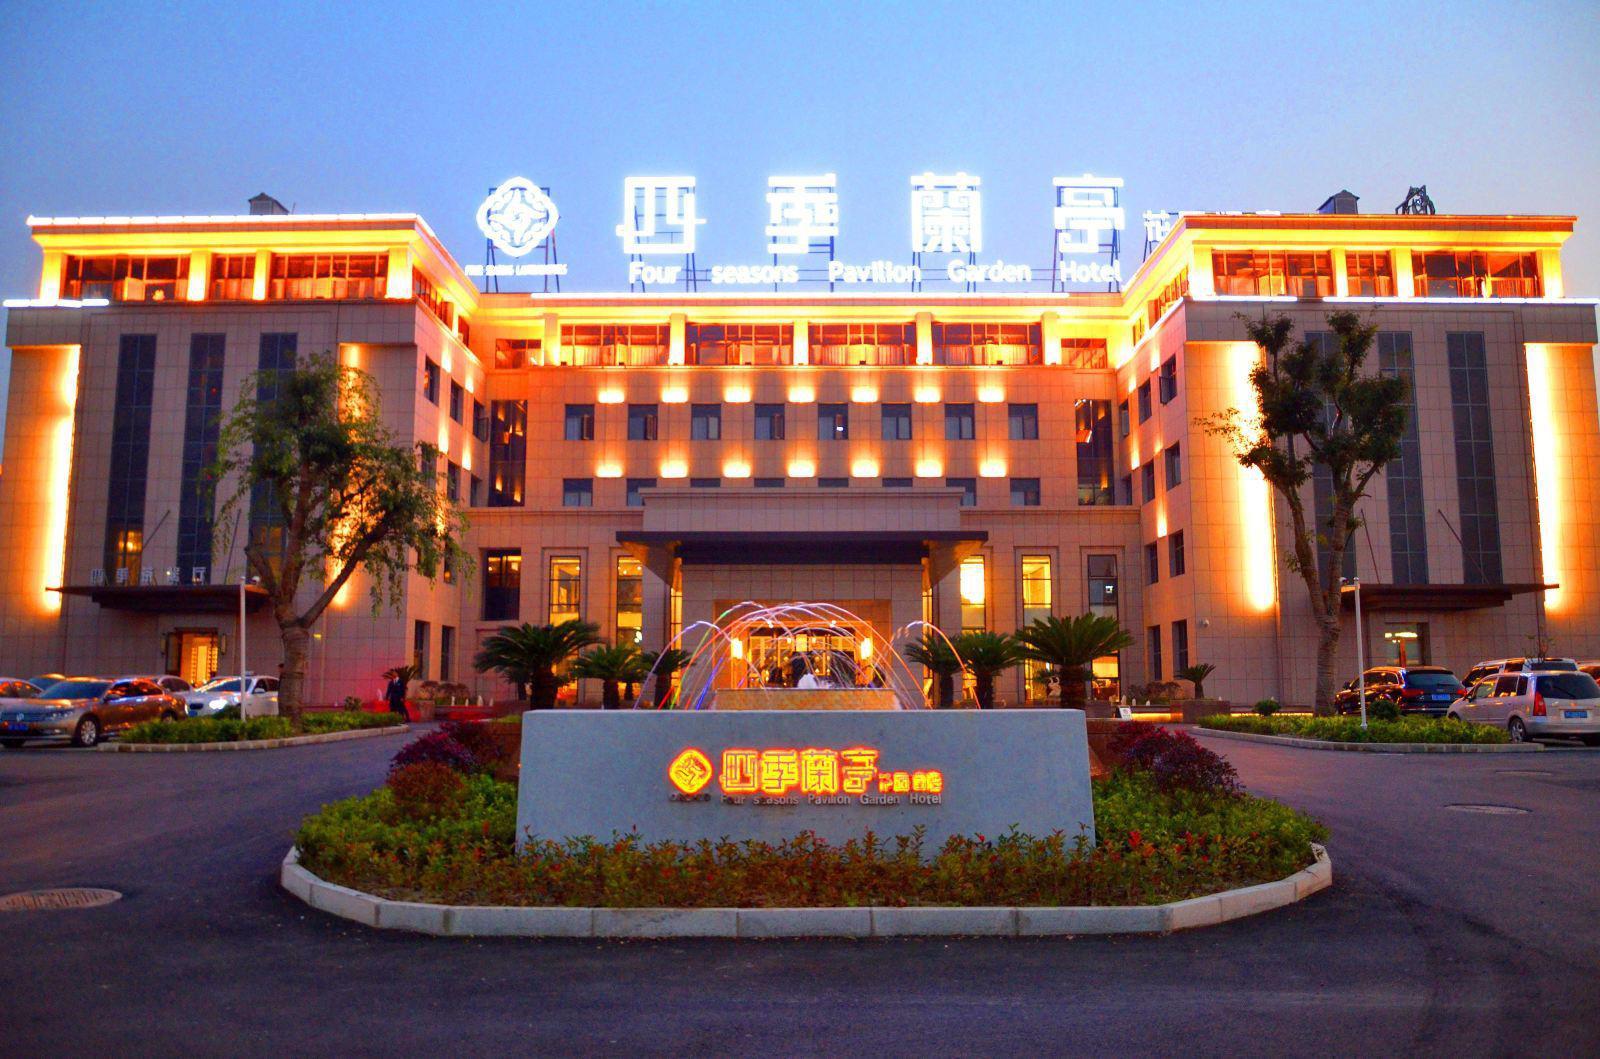 Four Seasons Pavilion Garden Hotel